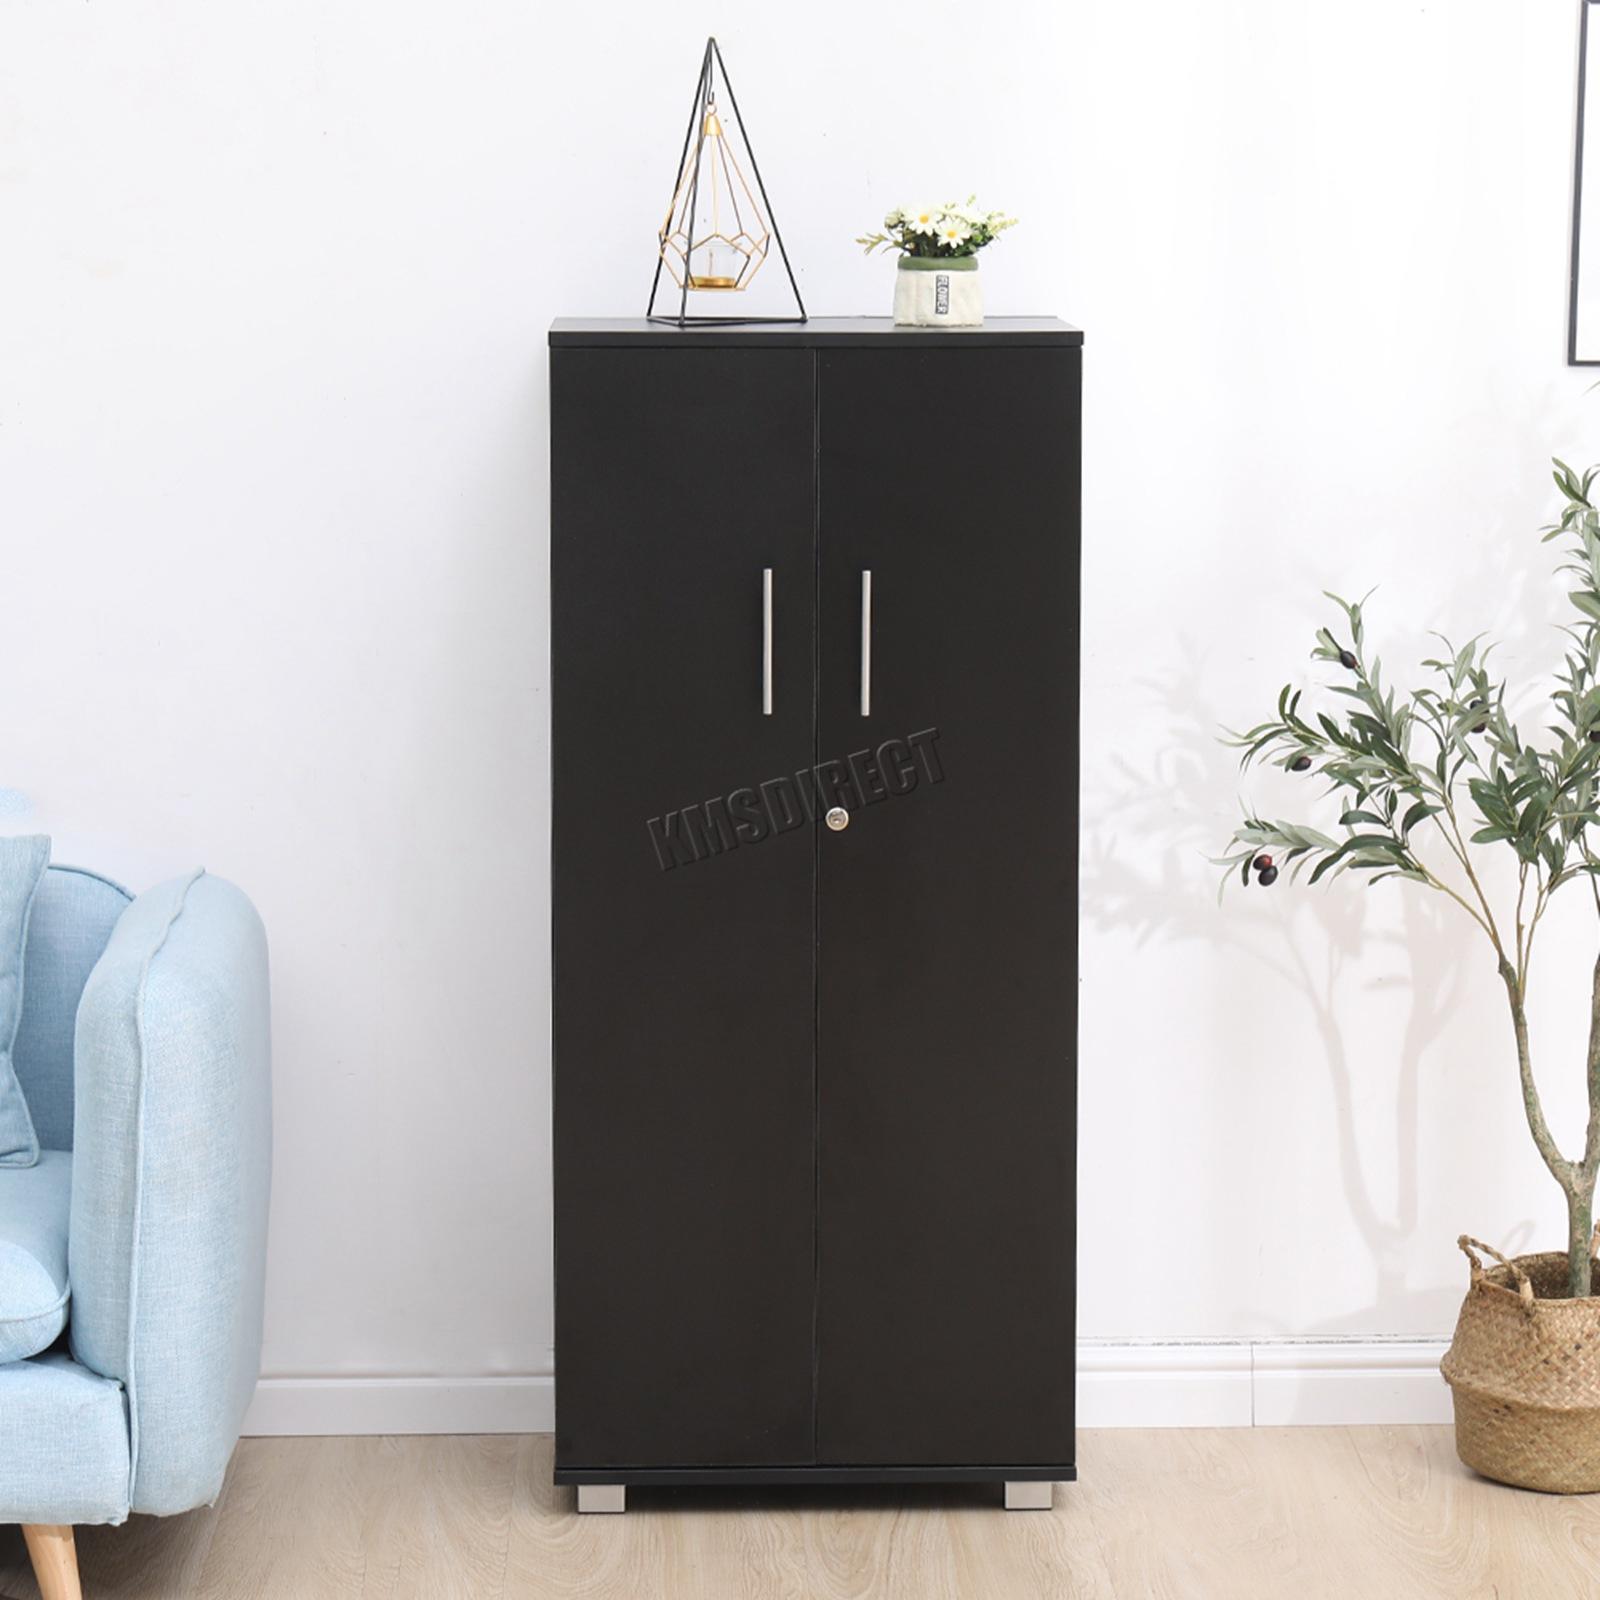 Cupboard Storage With Lock Wood Filing